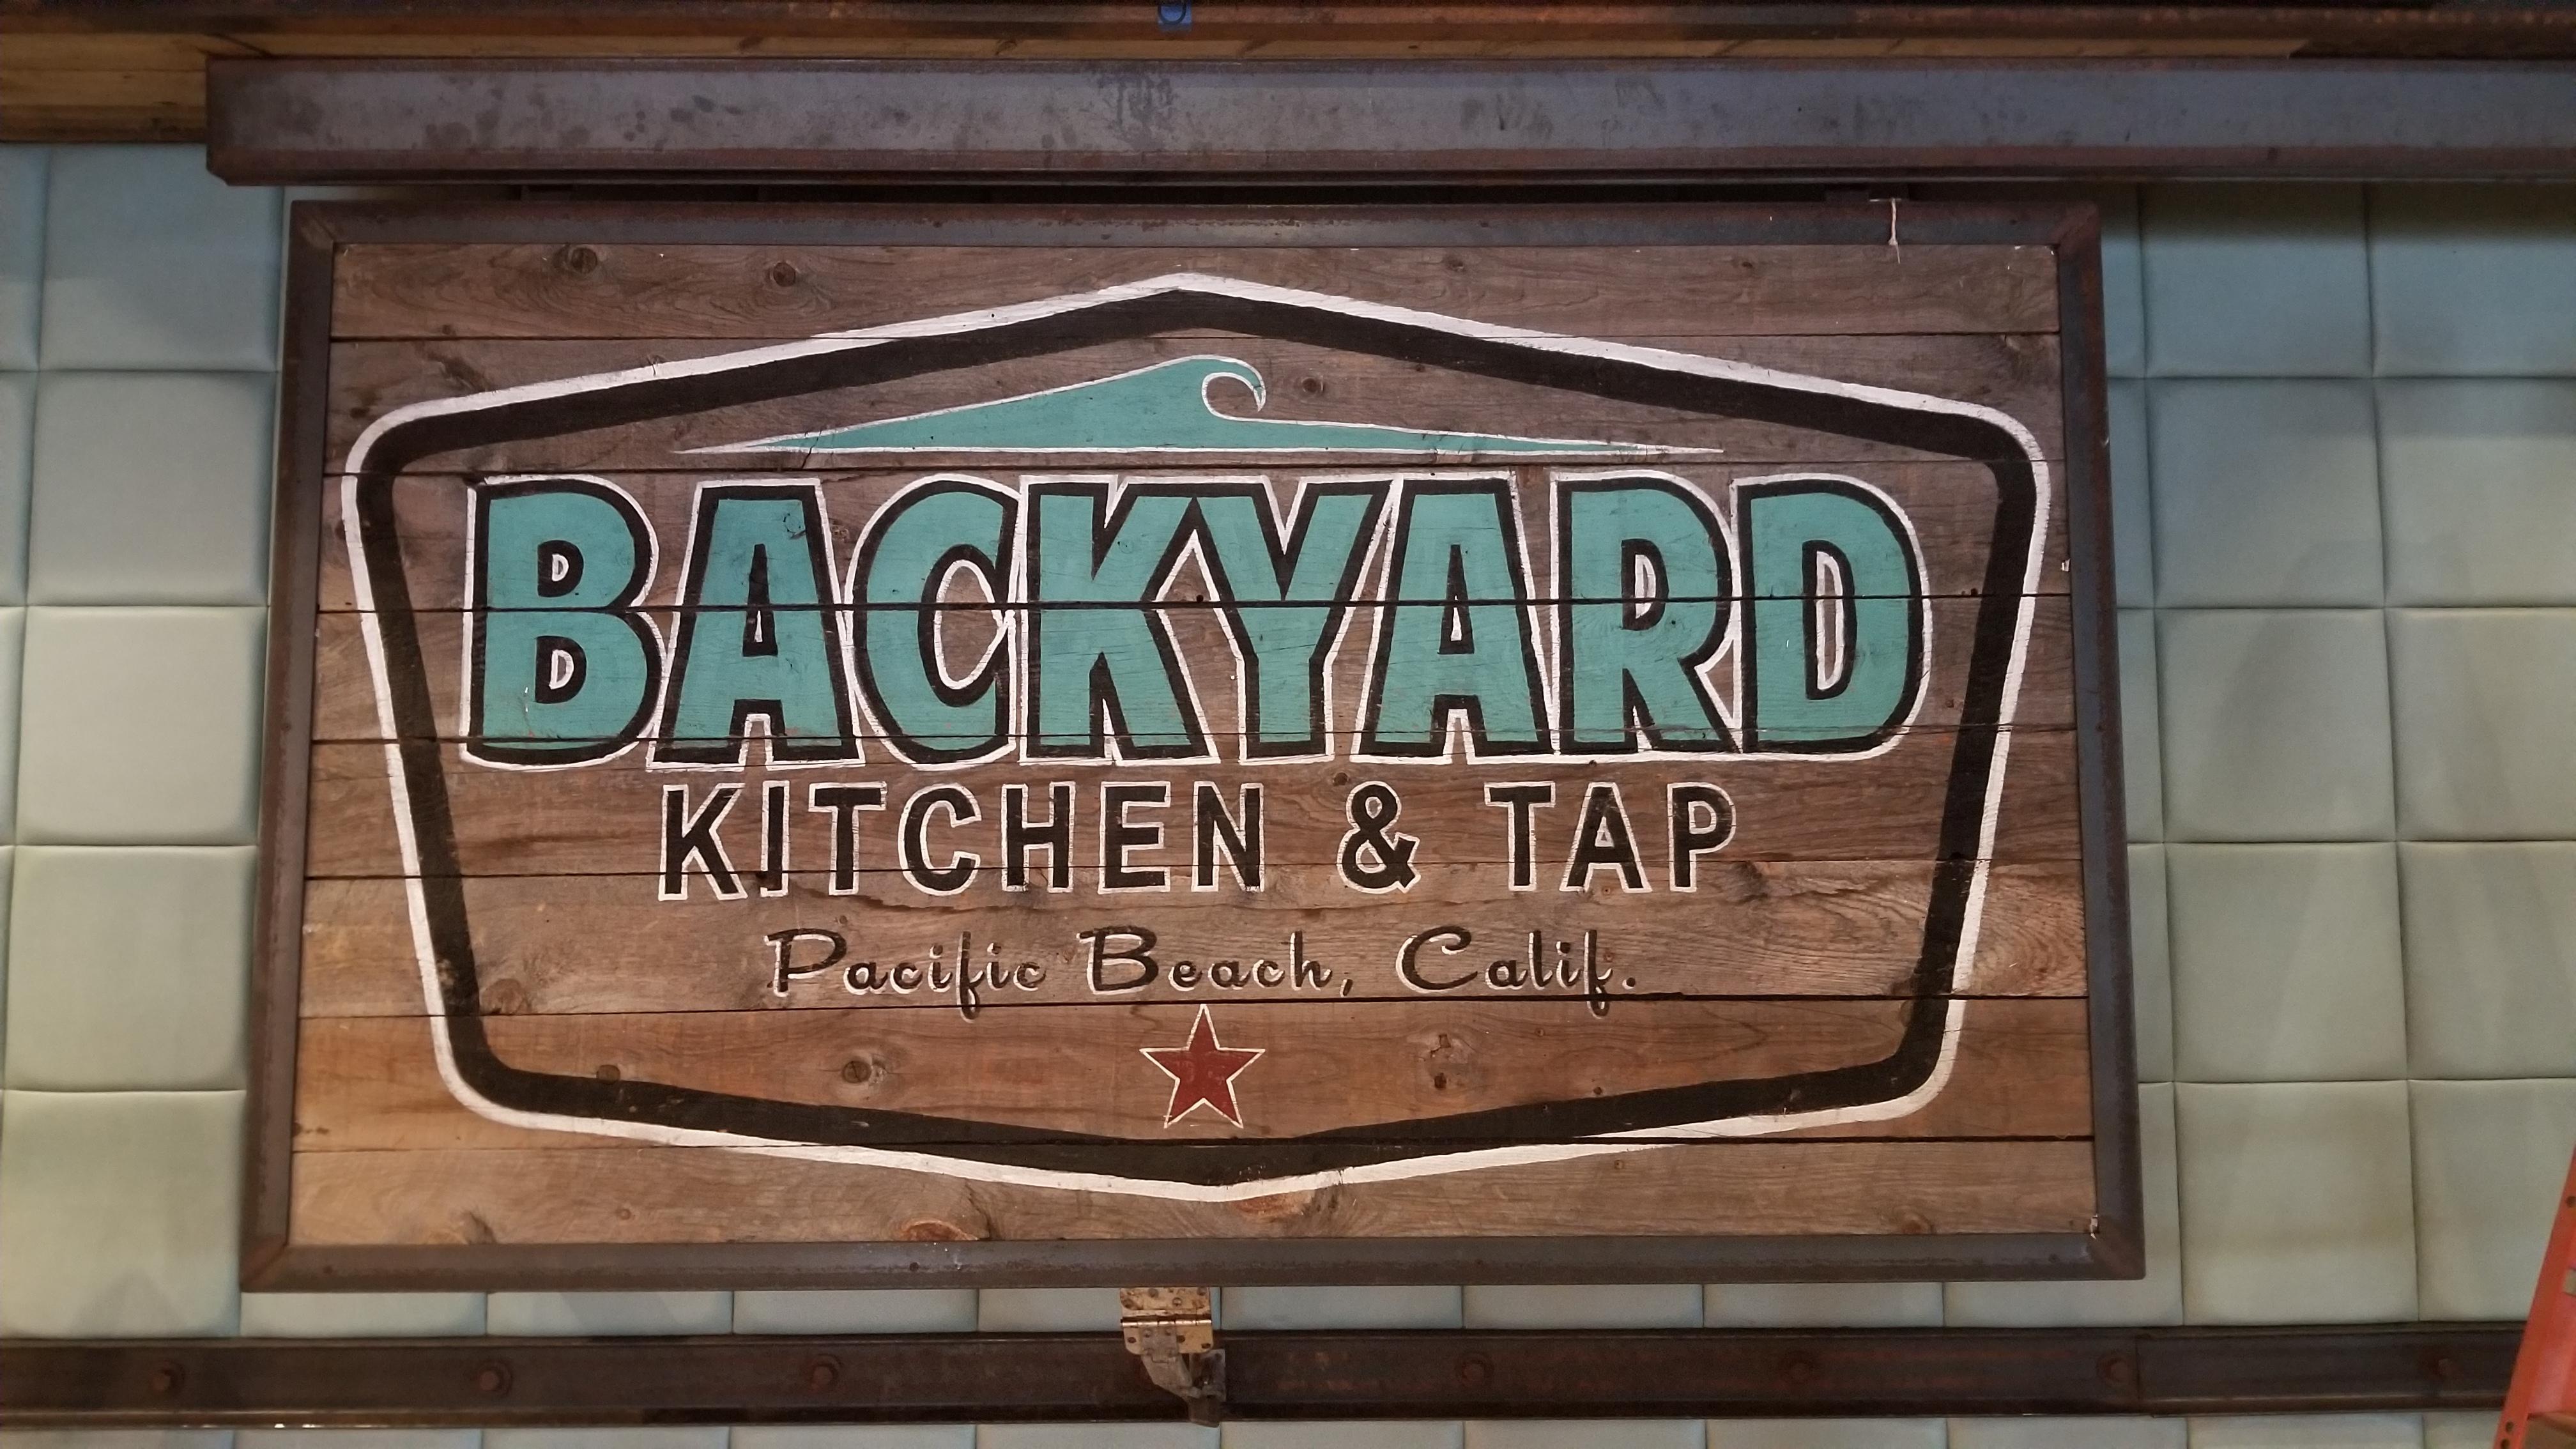 Backyard restuarant audio installation